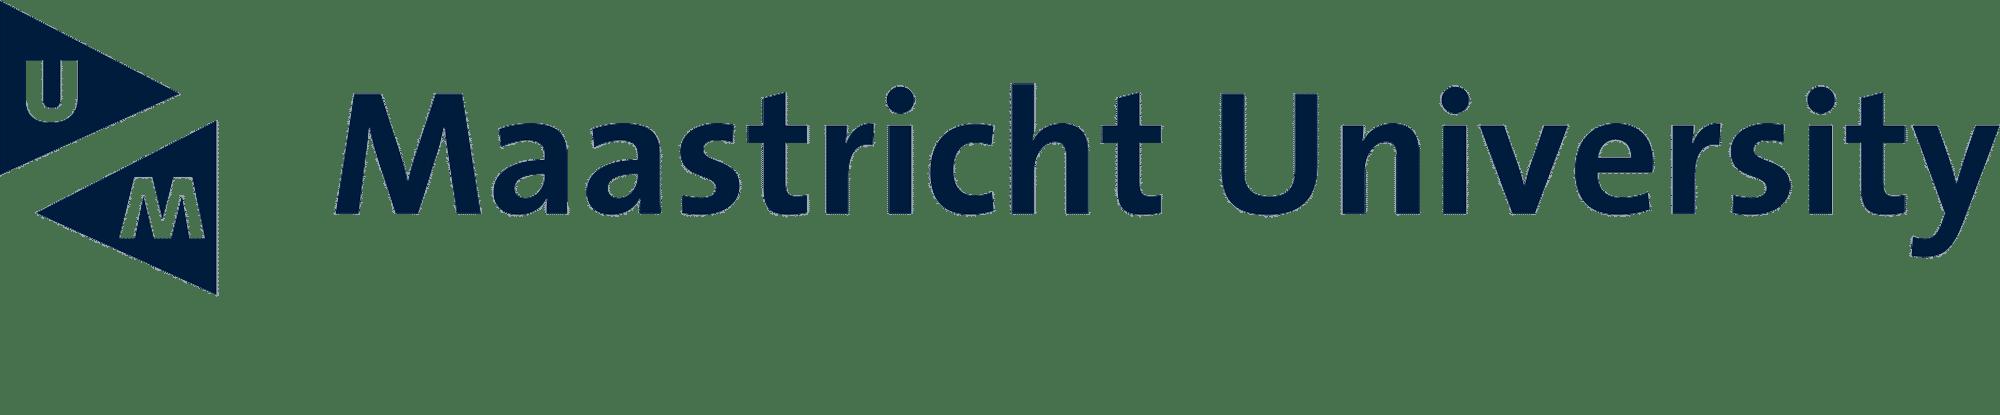 University Maastricht Logo